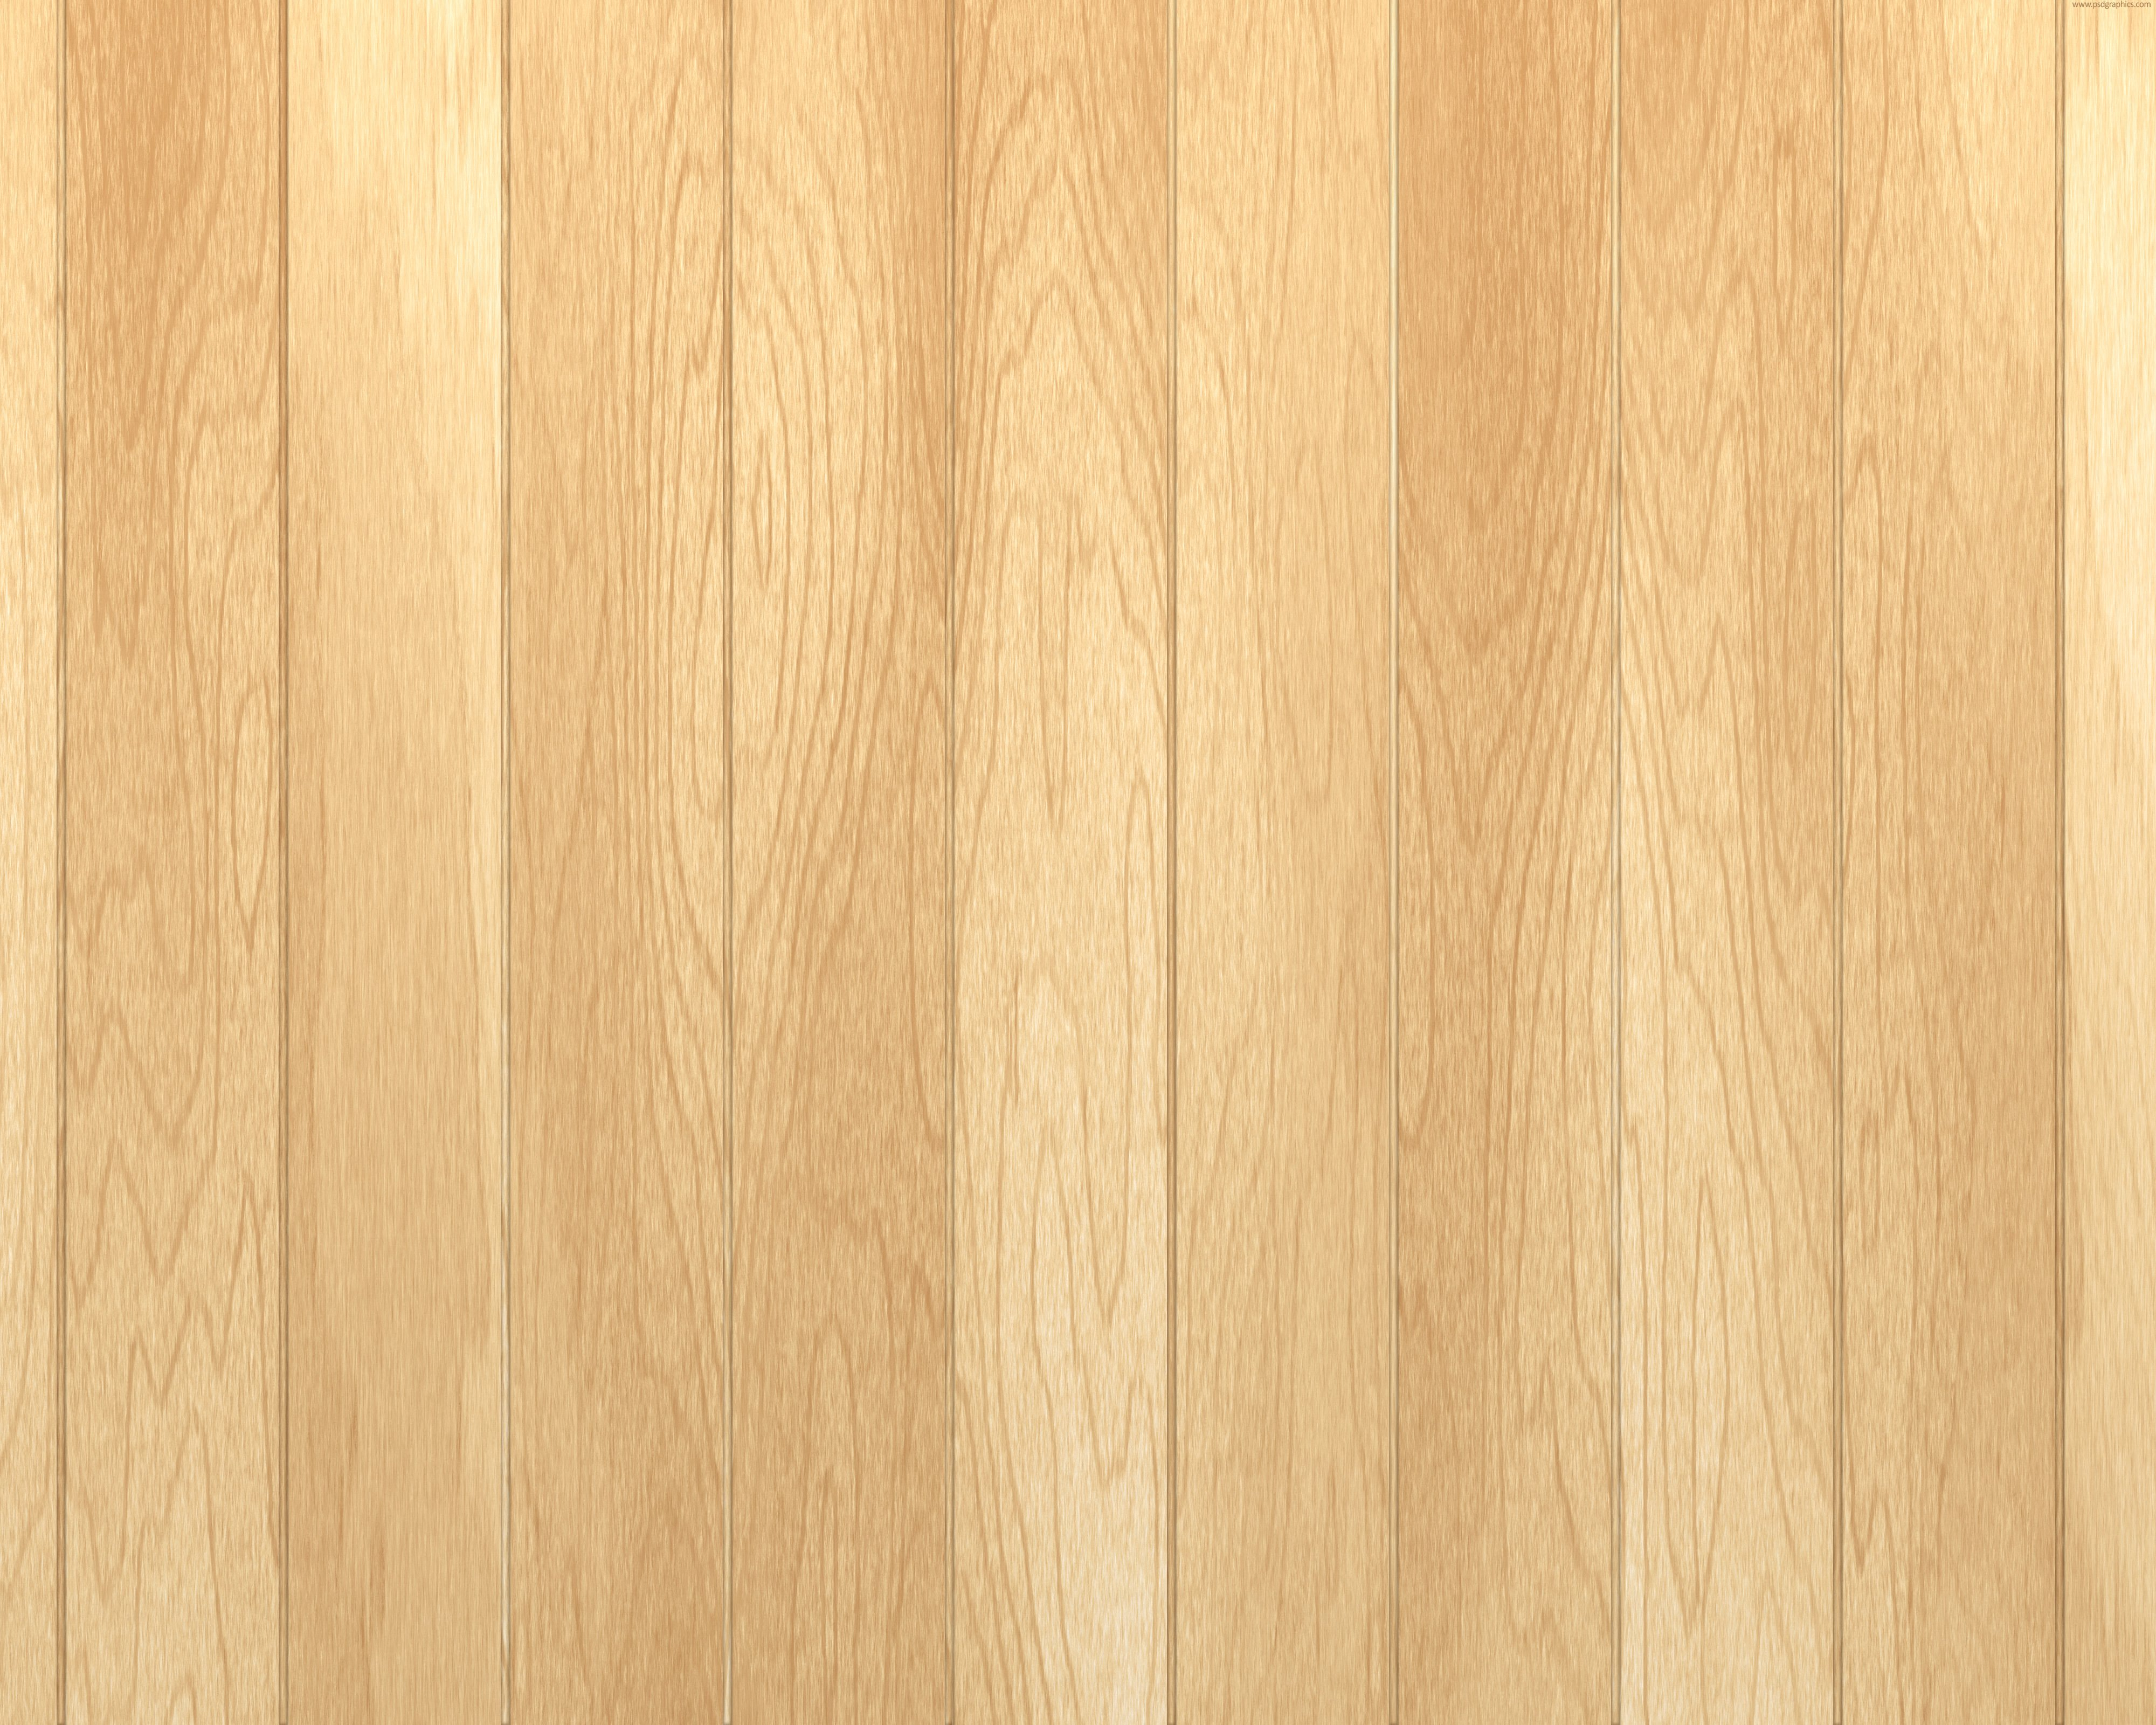 Wooden panels texture PSDGraphics 4000x3200